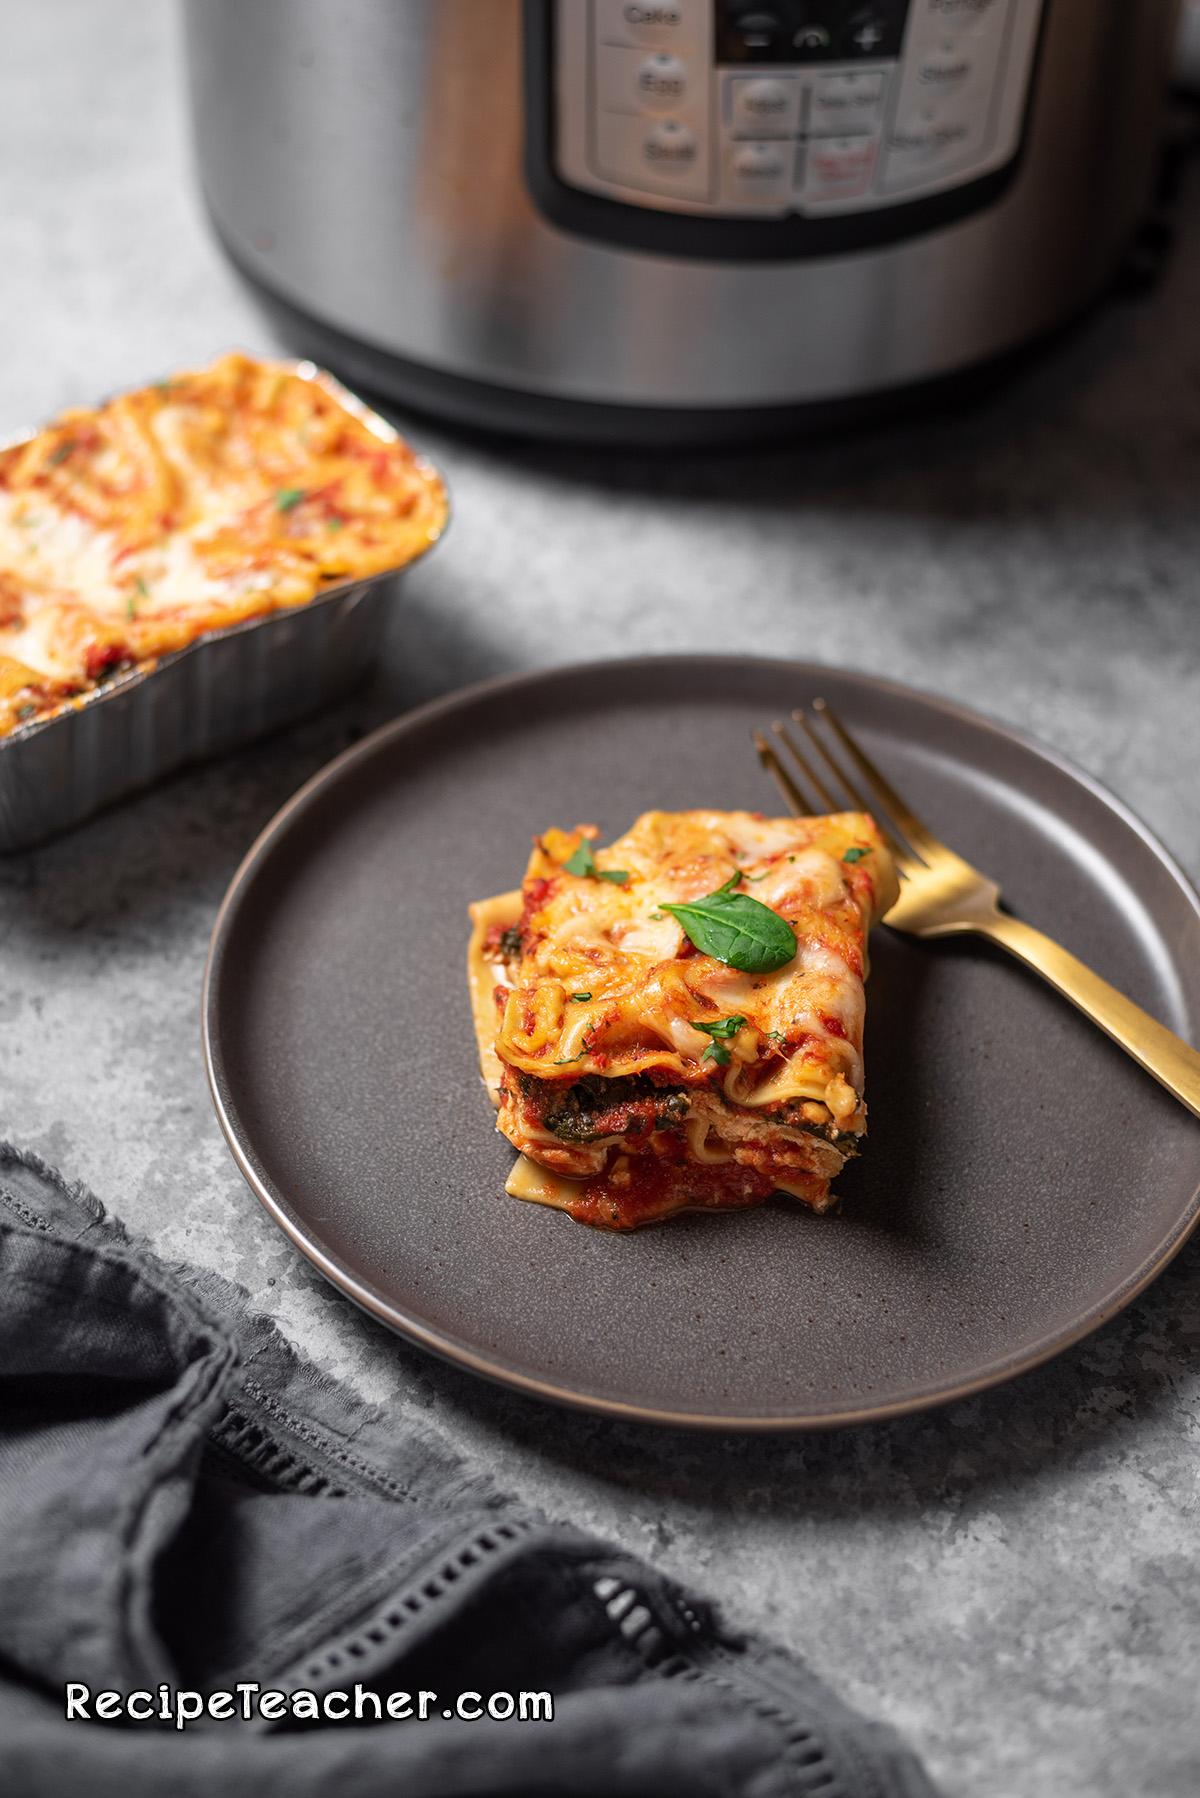 Recipe for homemade Instant Pot Lasagna